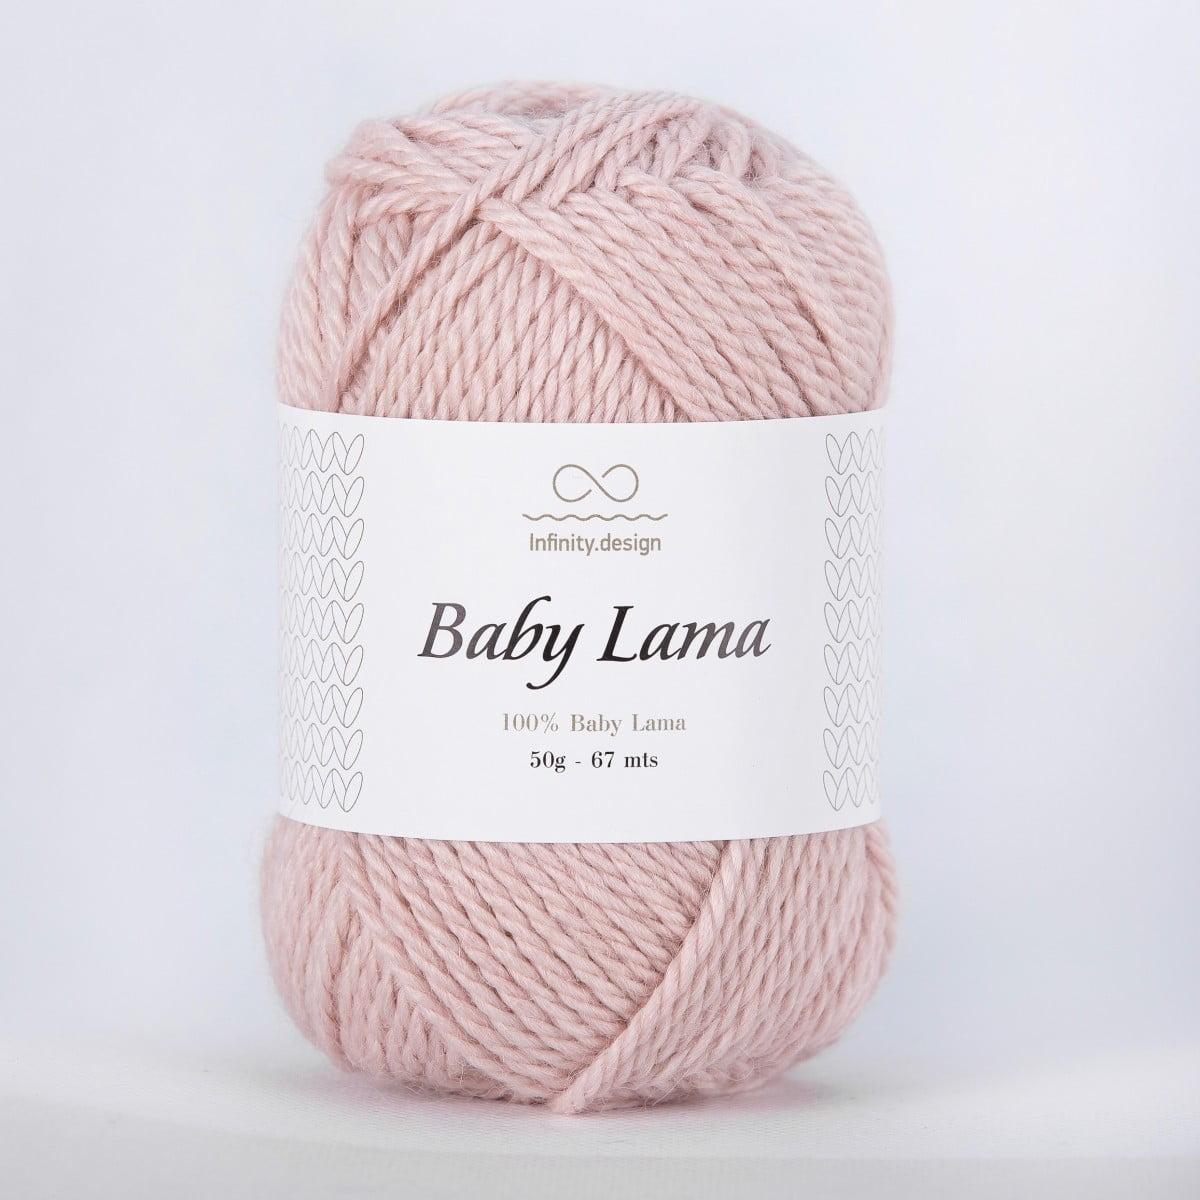 Пряжа Baby Lama Infinity design